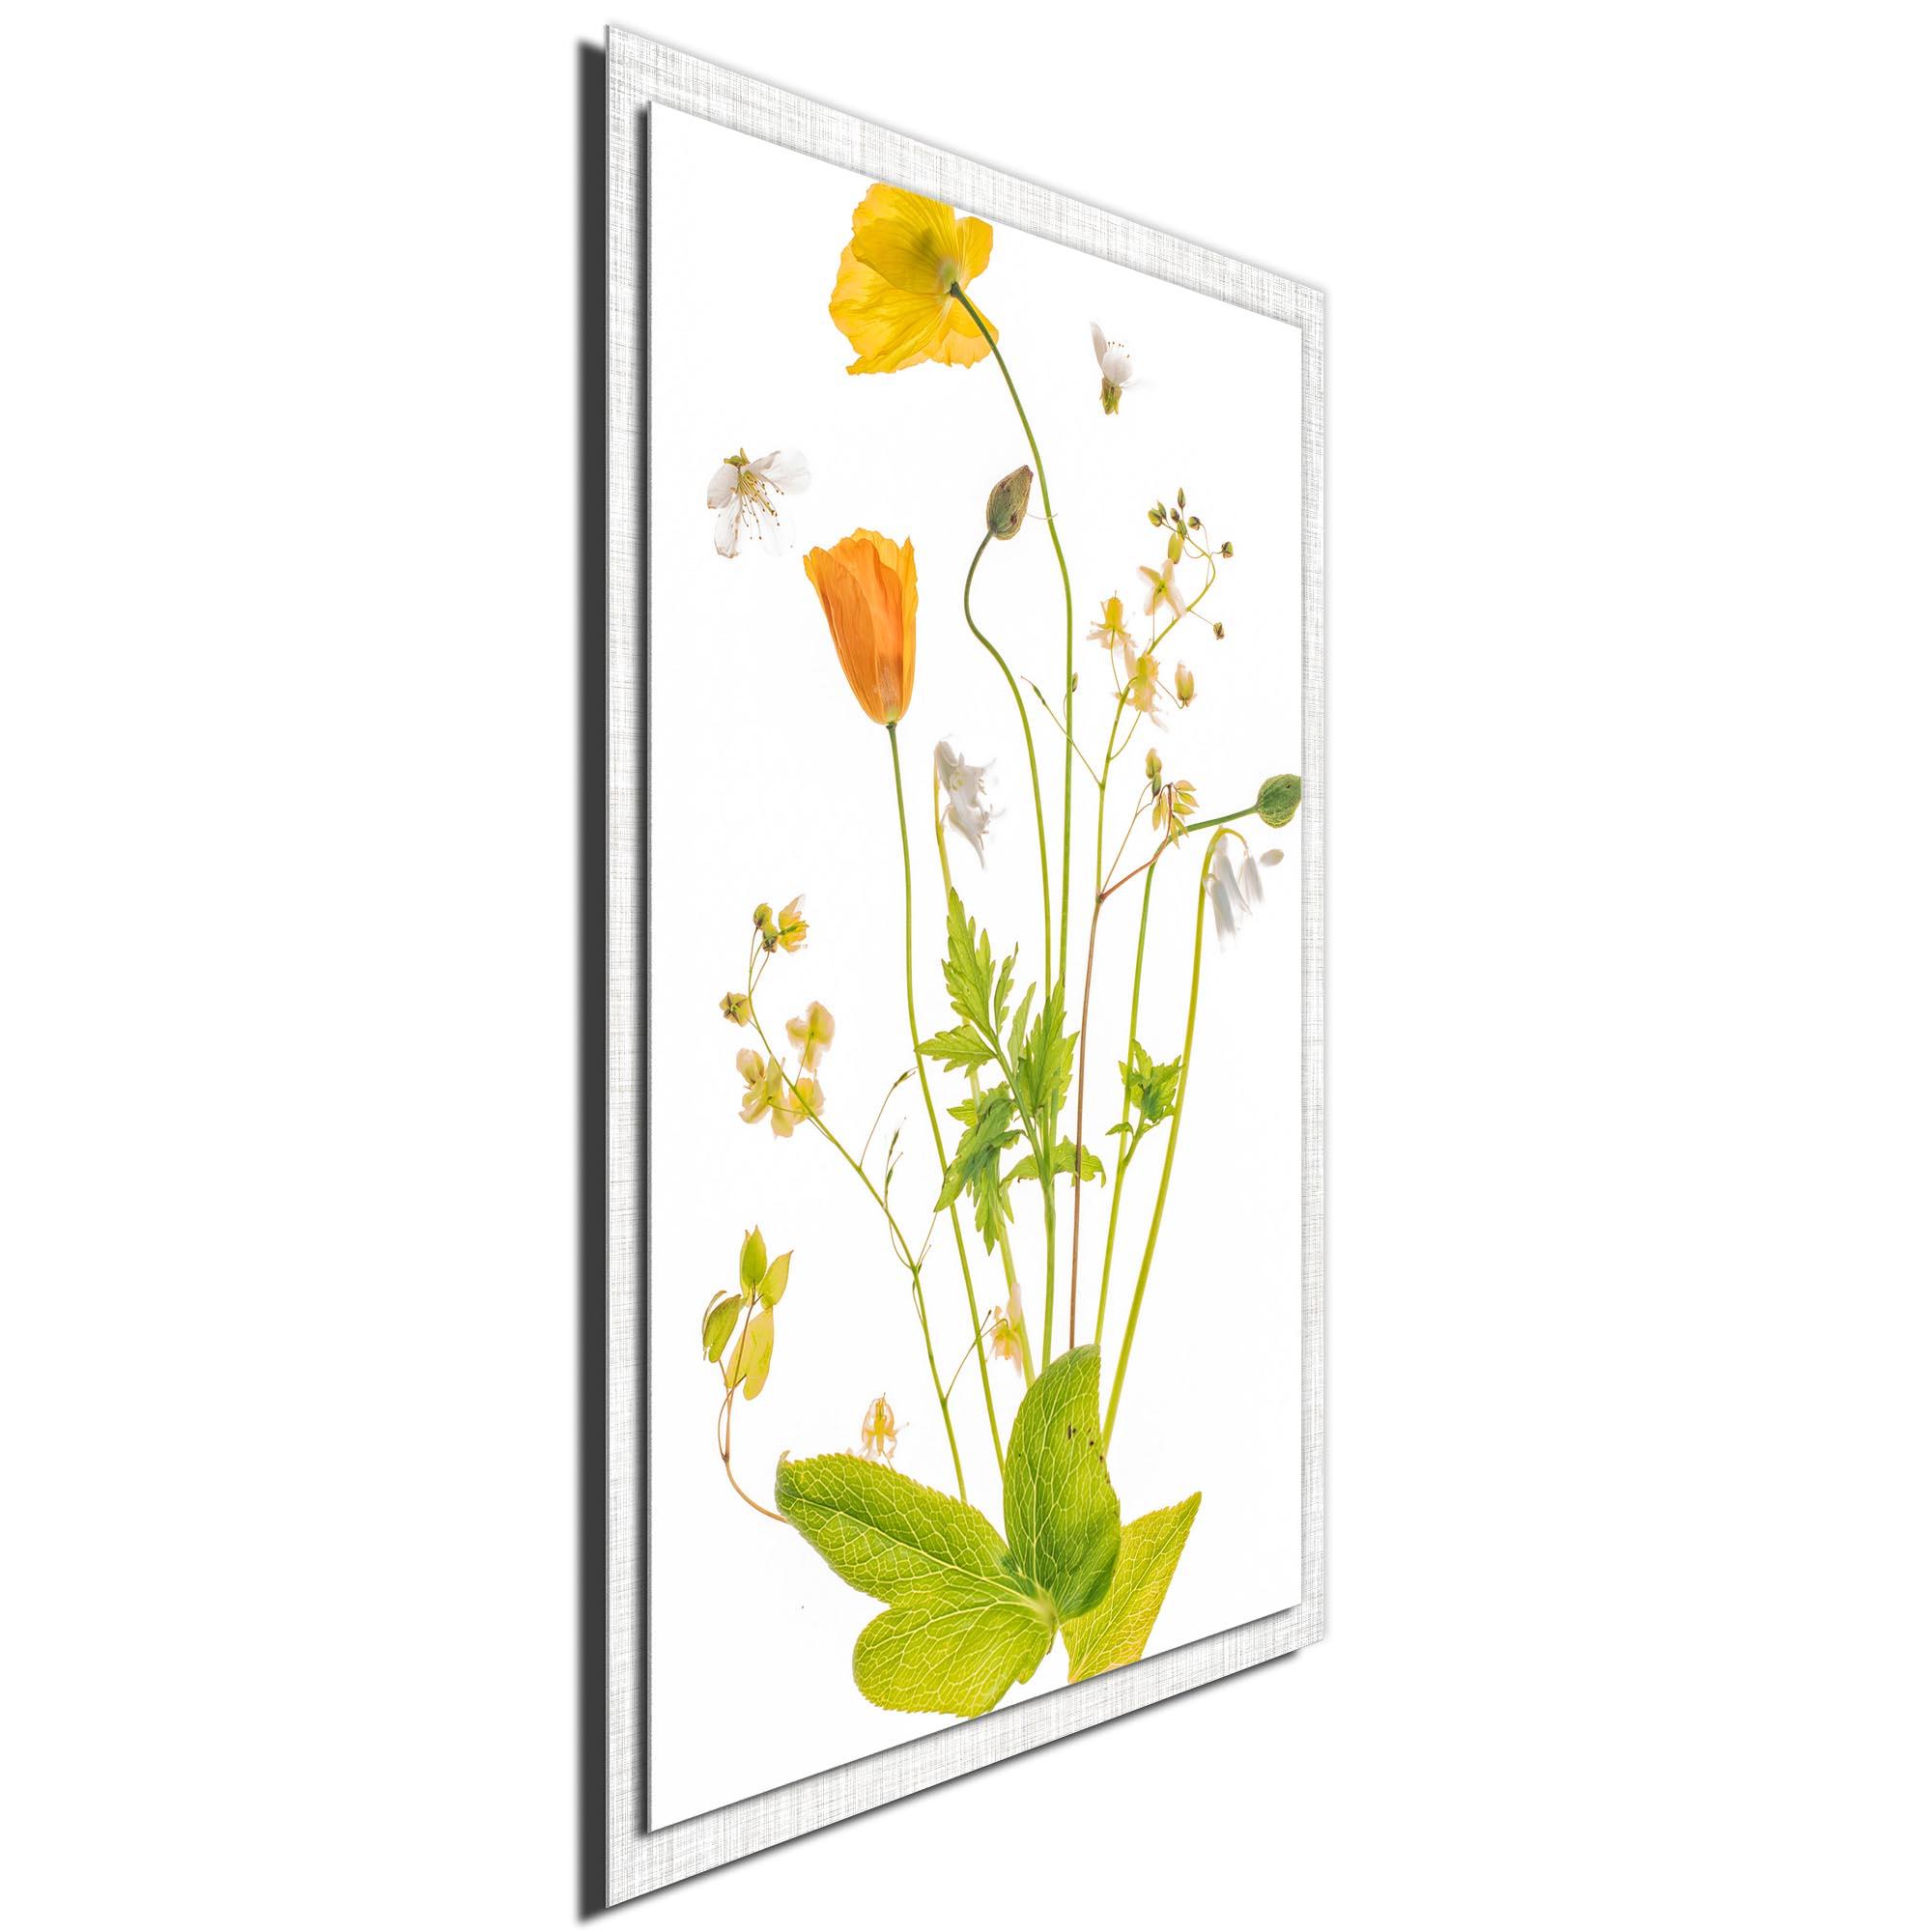 Fairy Garden by Sharon Williams - Modern Farmhouse Floral on Metal - Image 2